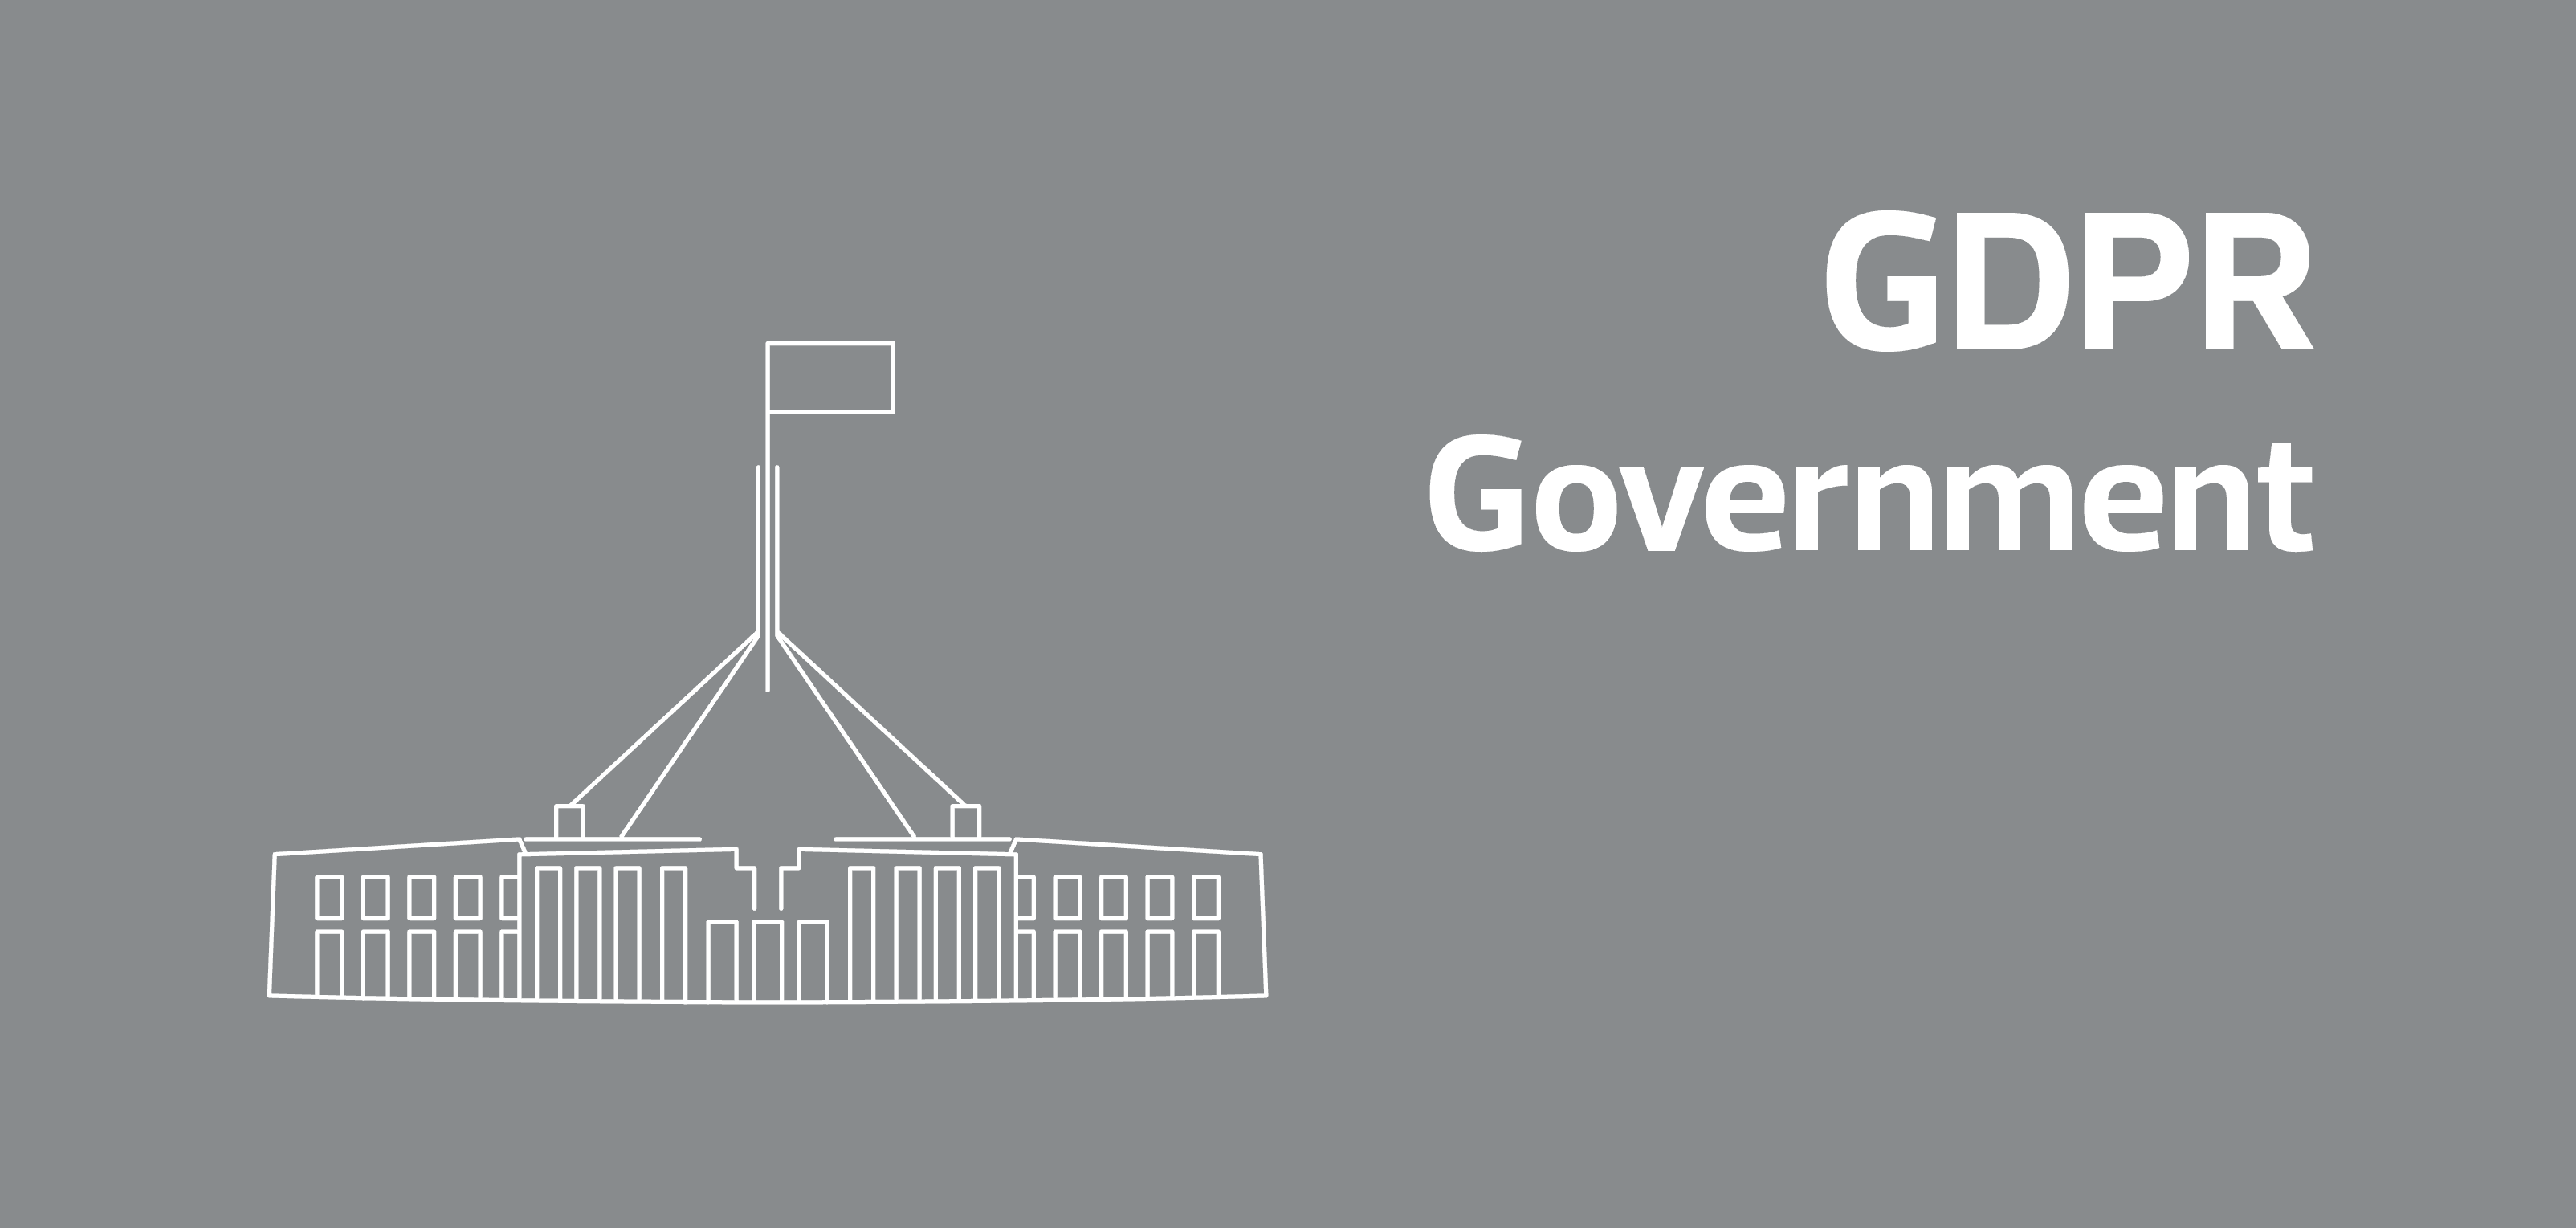 public://media/Thumbnails/gdpr_thumbnails_government.png